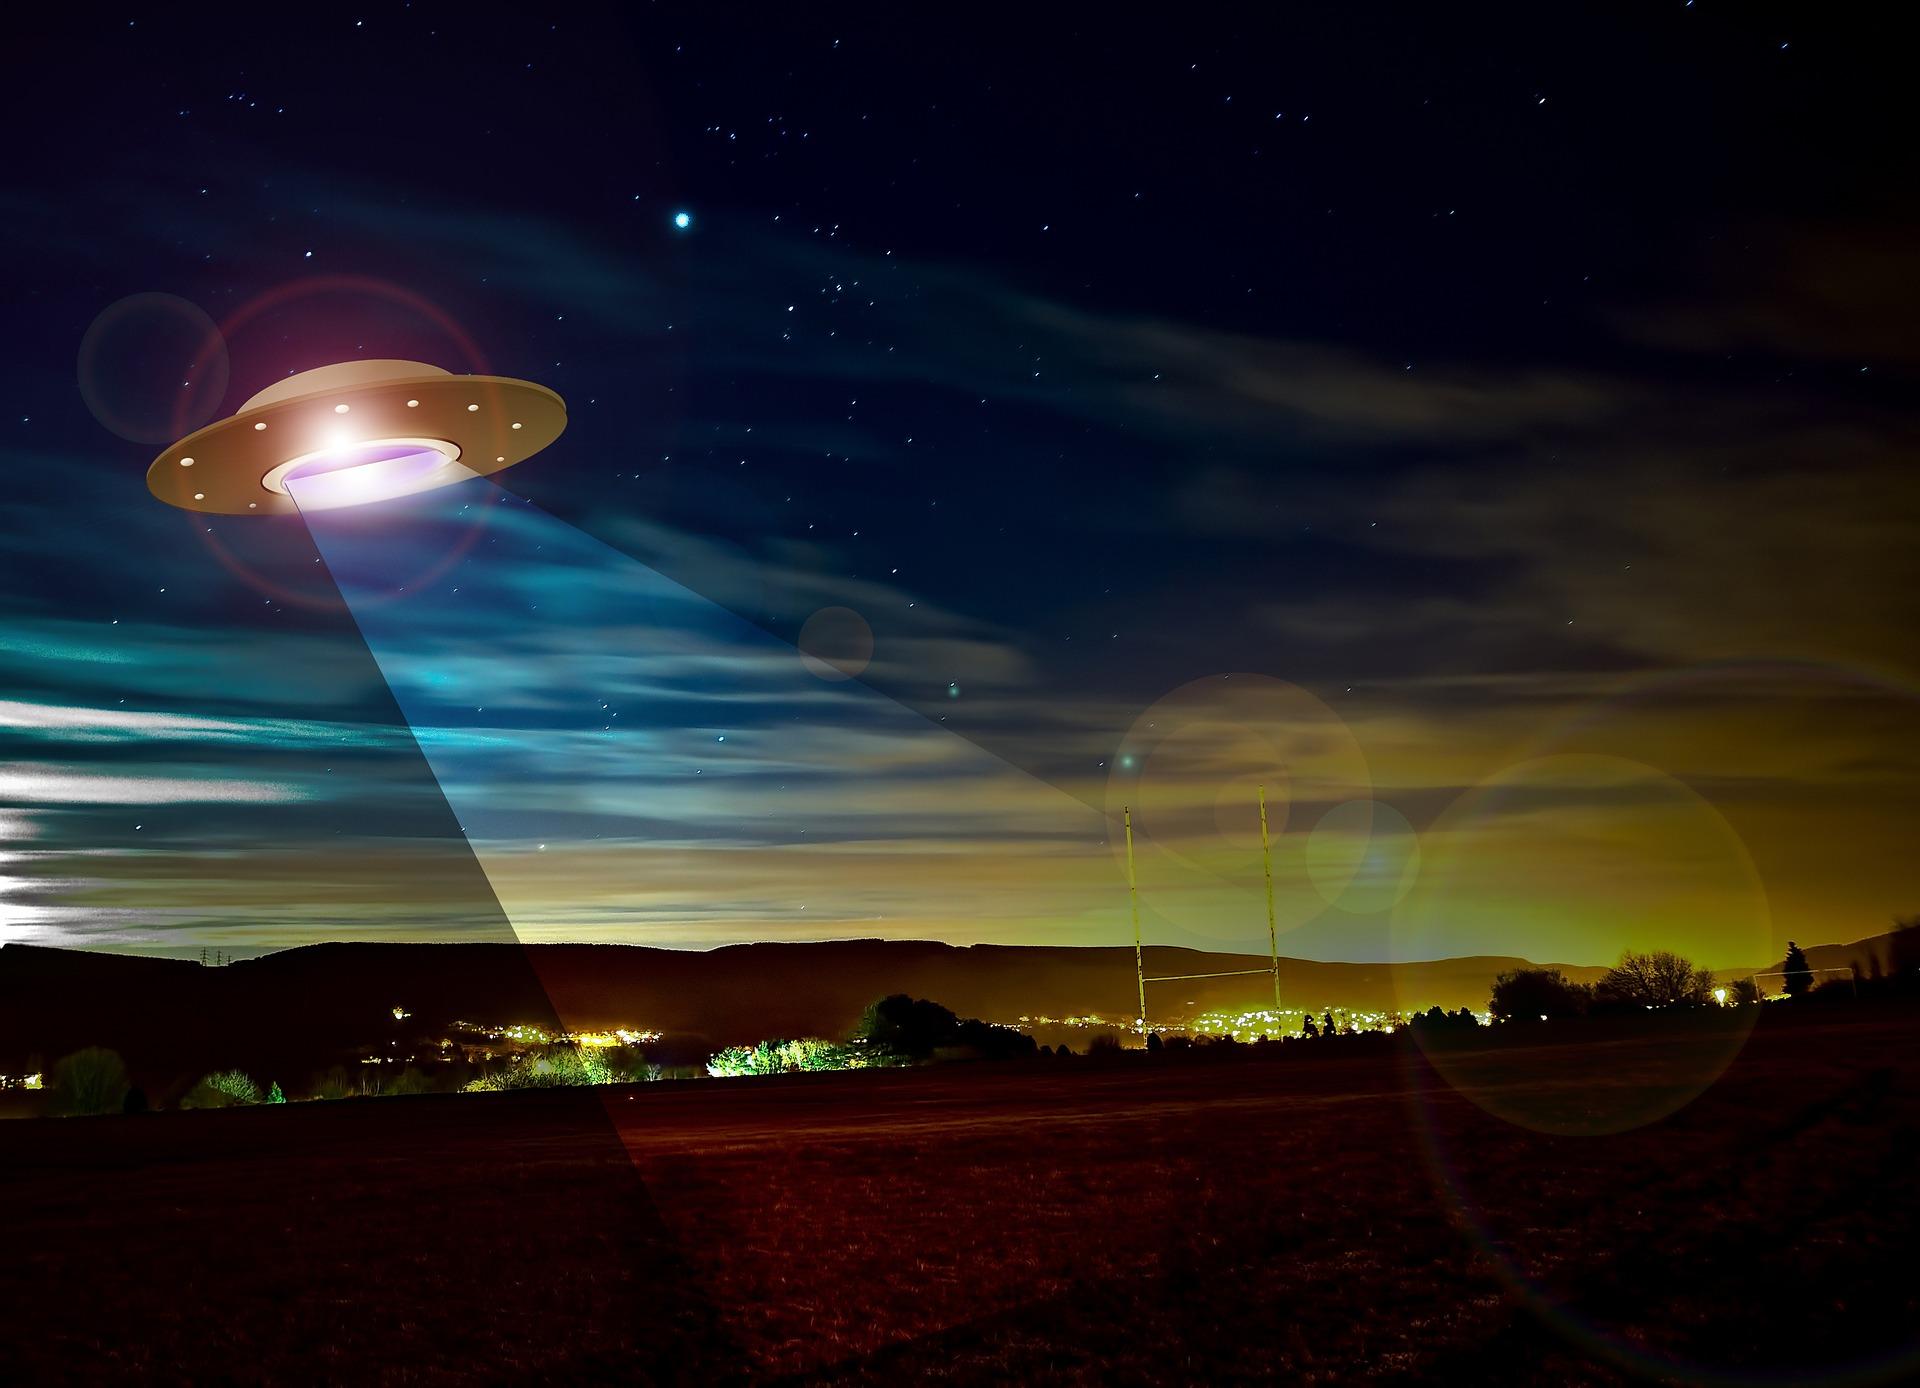 ufo, alien, aliens, paranormal